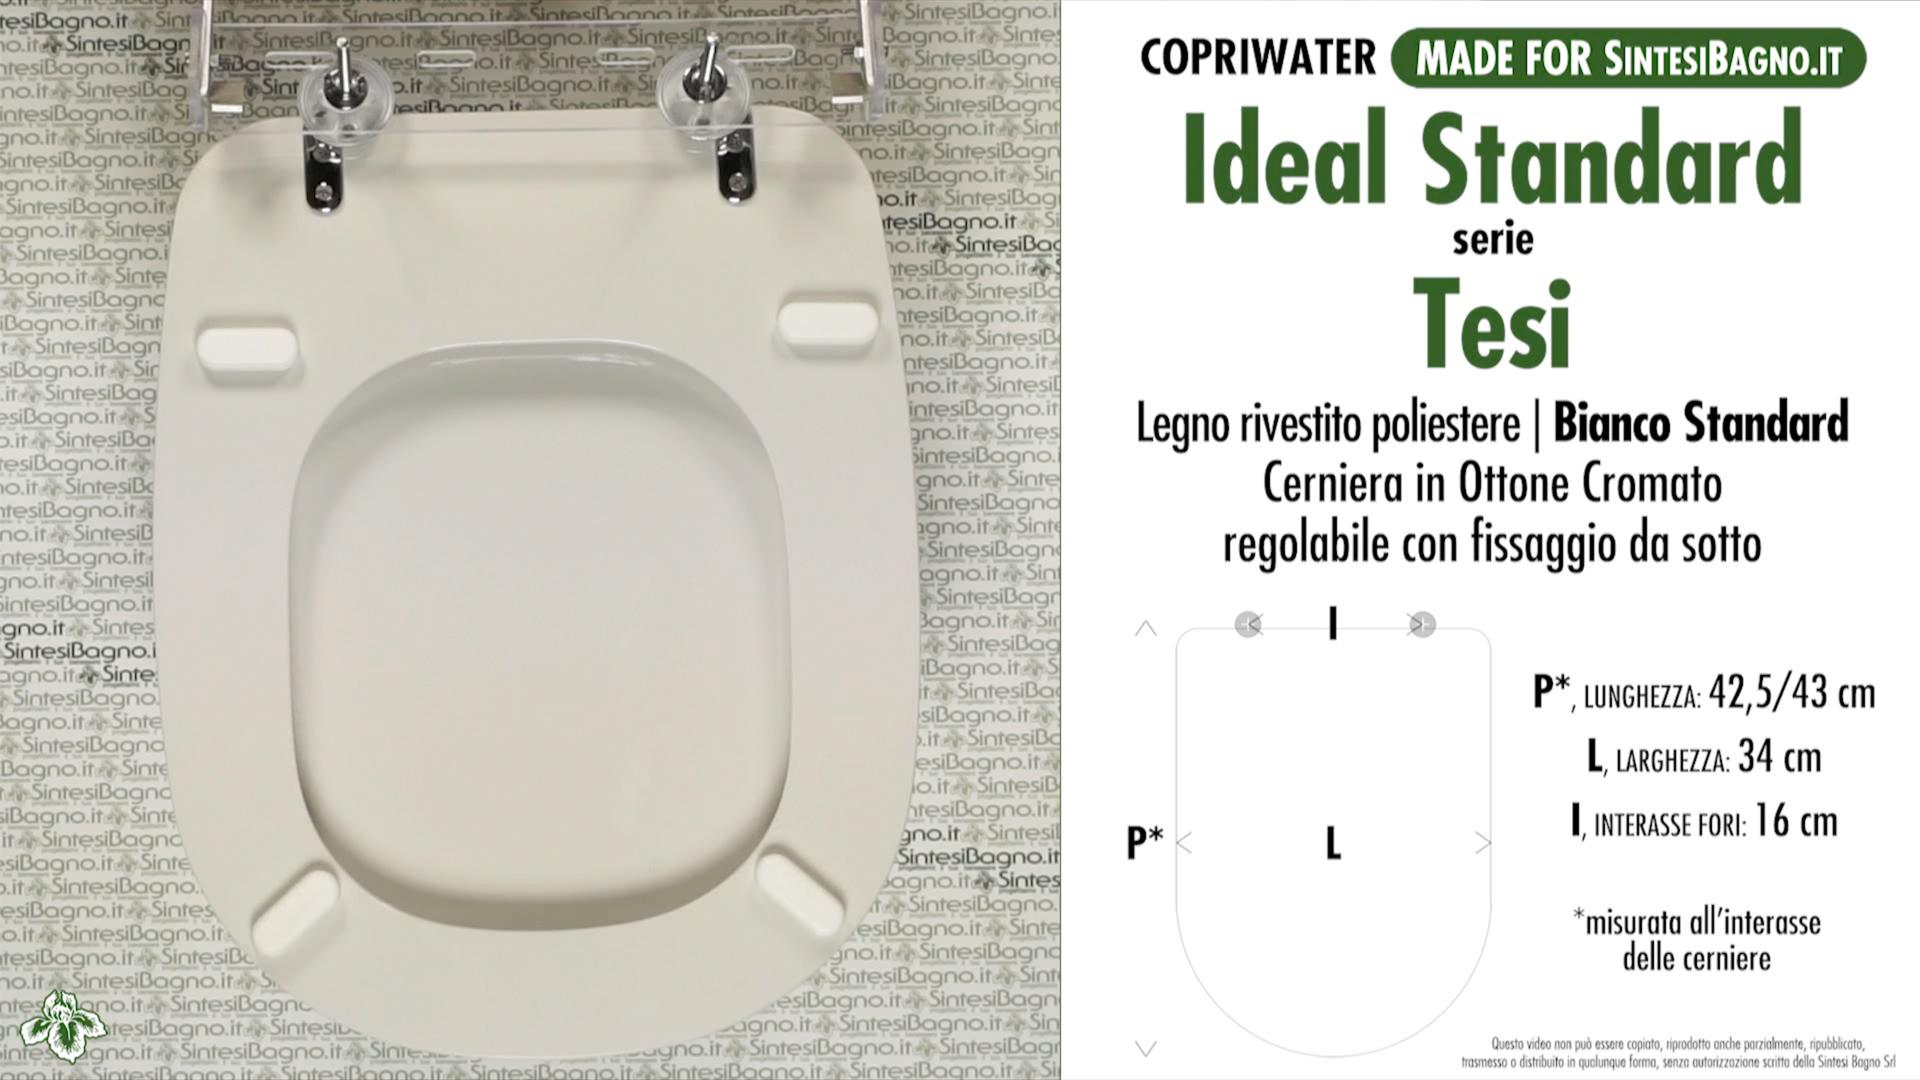 Copriwater per wc tesi ideal standard bianco standard for Ideal standard cantica copriwater